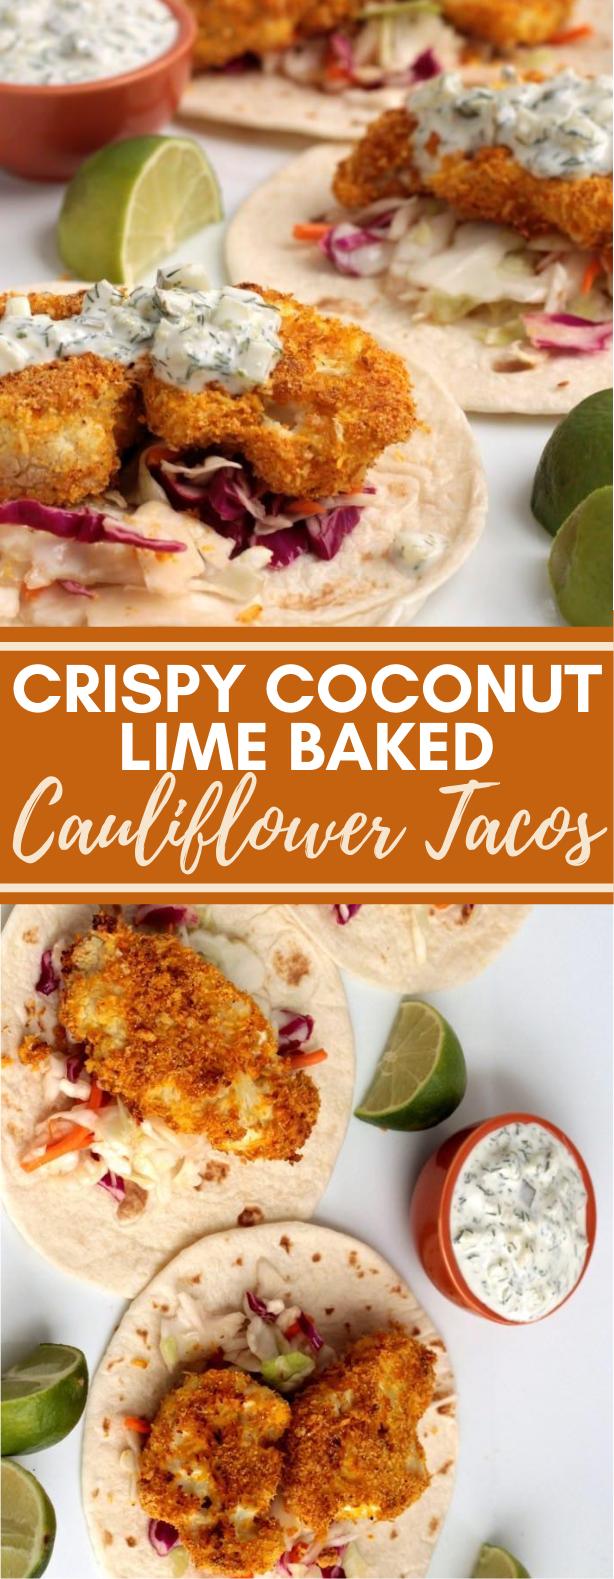 CRISPY COCONUT LIME BAKED CAULIFLOWER TACOS #vegetarian #lunch #veggies #cauliflower #comfortfood